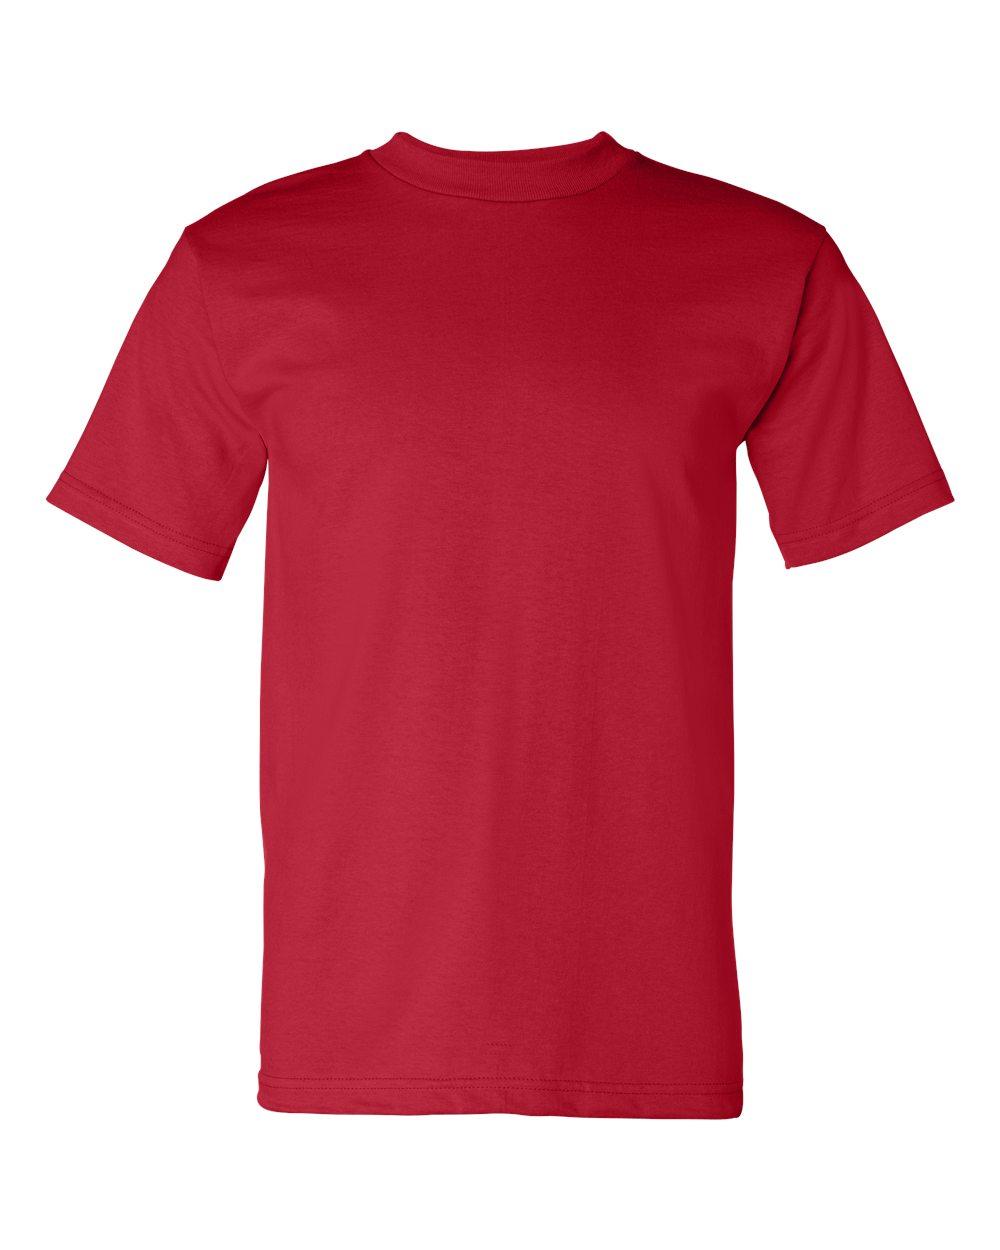 Bayside-Mens-Cotton-Blank-USA-Made-Short-Sleeve-T-Shirt-5100-up-to-5XL thumbnail 33